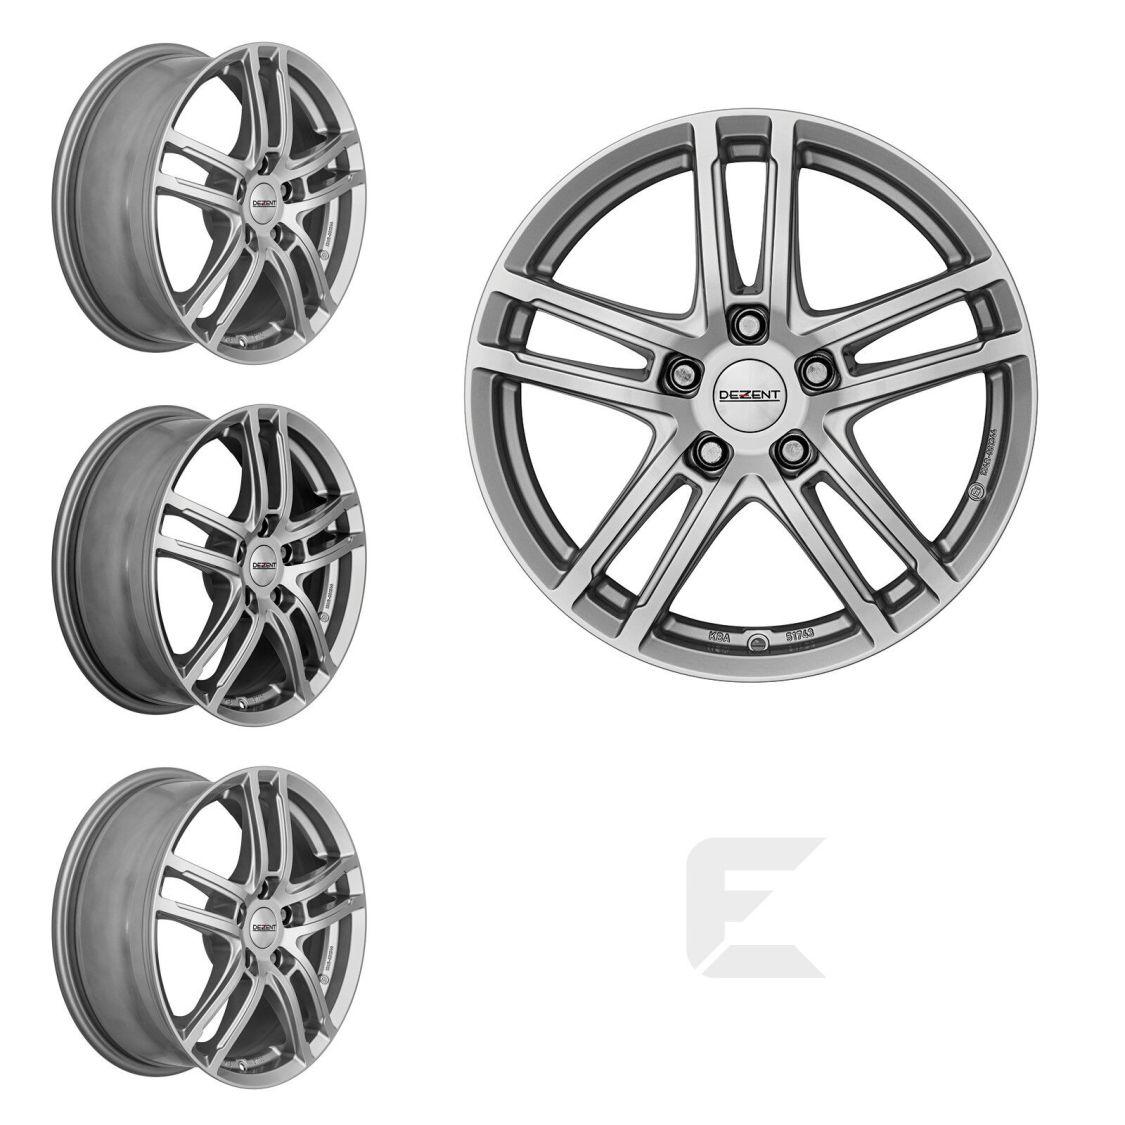 4x 16 Zoll Alufelgen für Nissan Micra / Dezent TZ 6,5x16 ET45 (B-83027160)